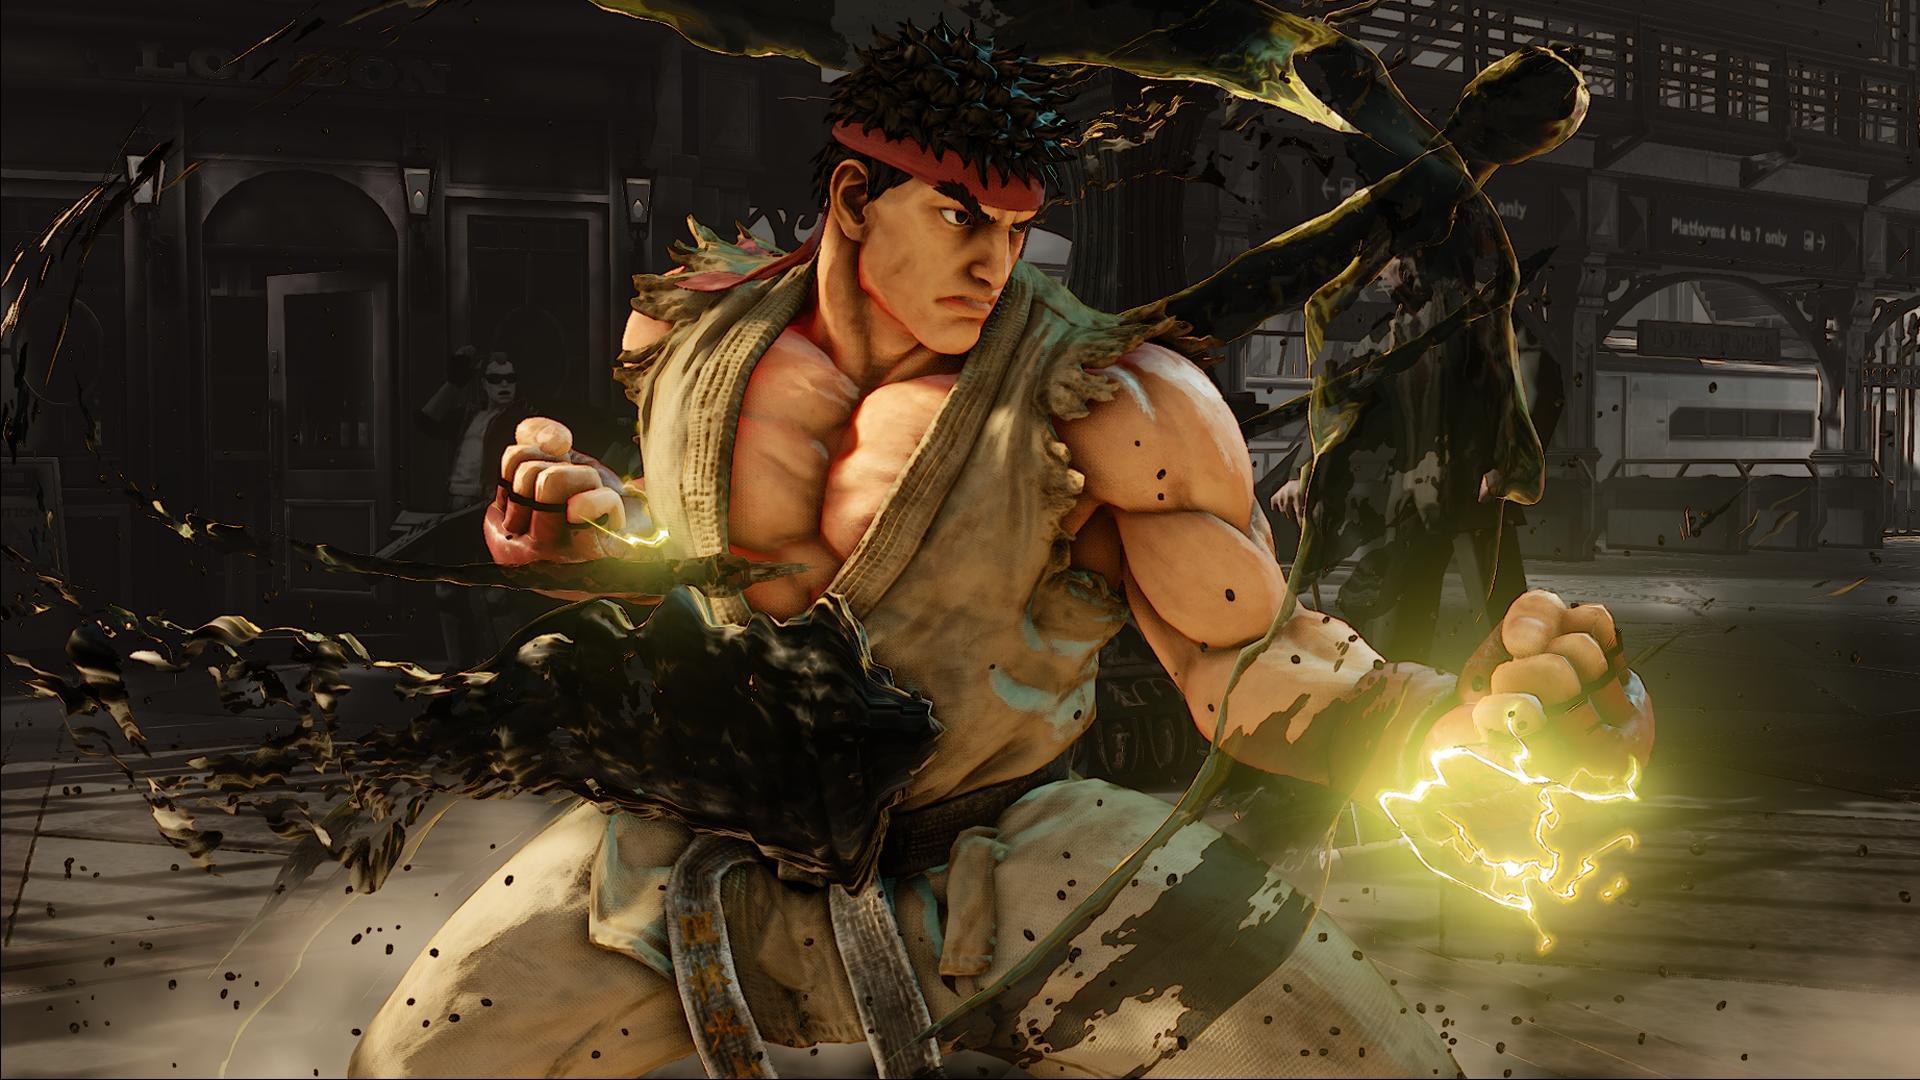 Screenshoty z bojovky Street Fighter V 109955